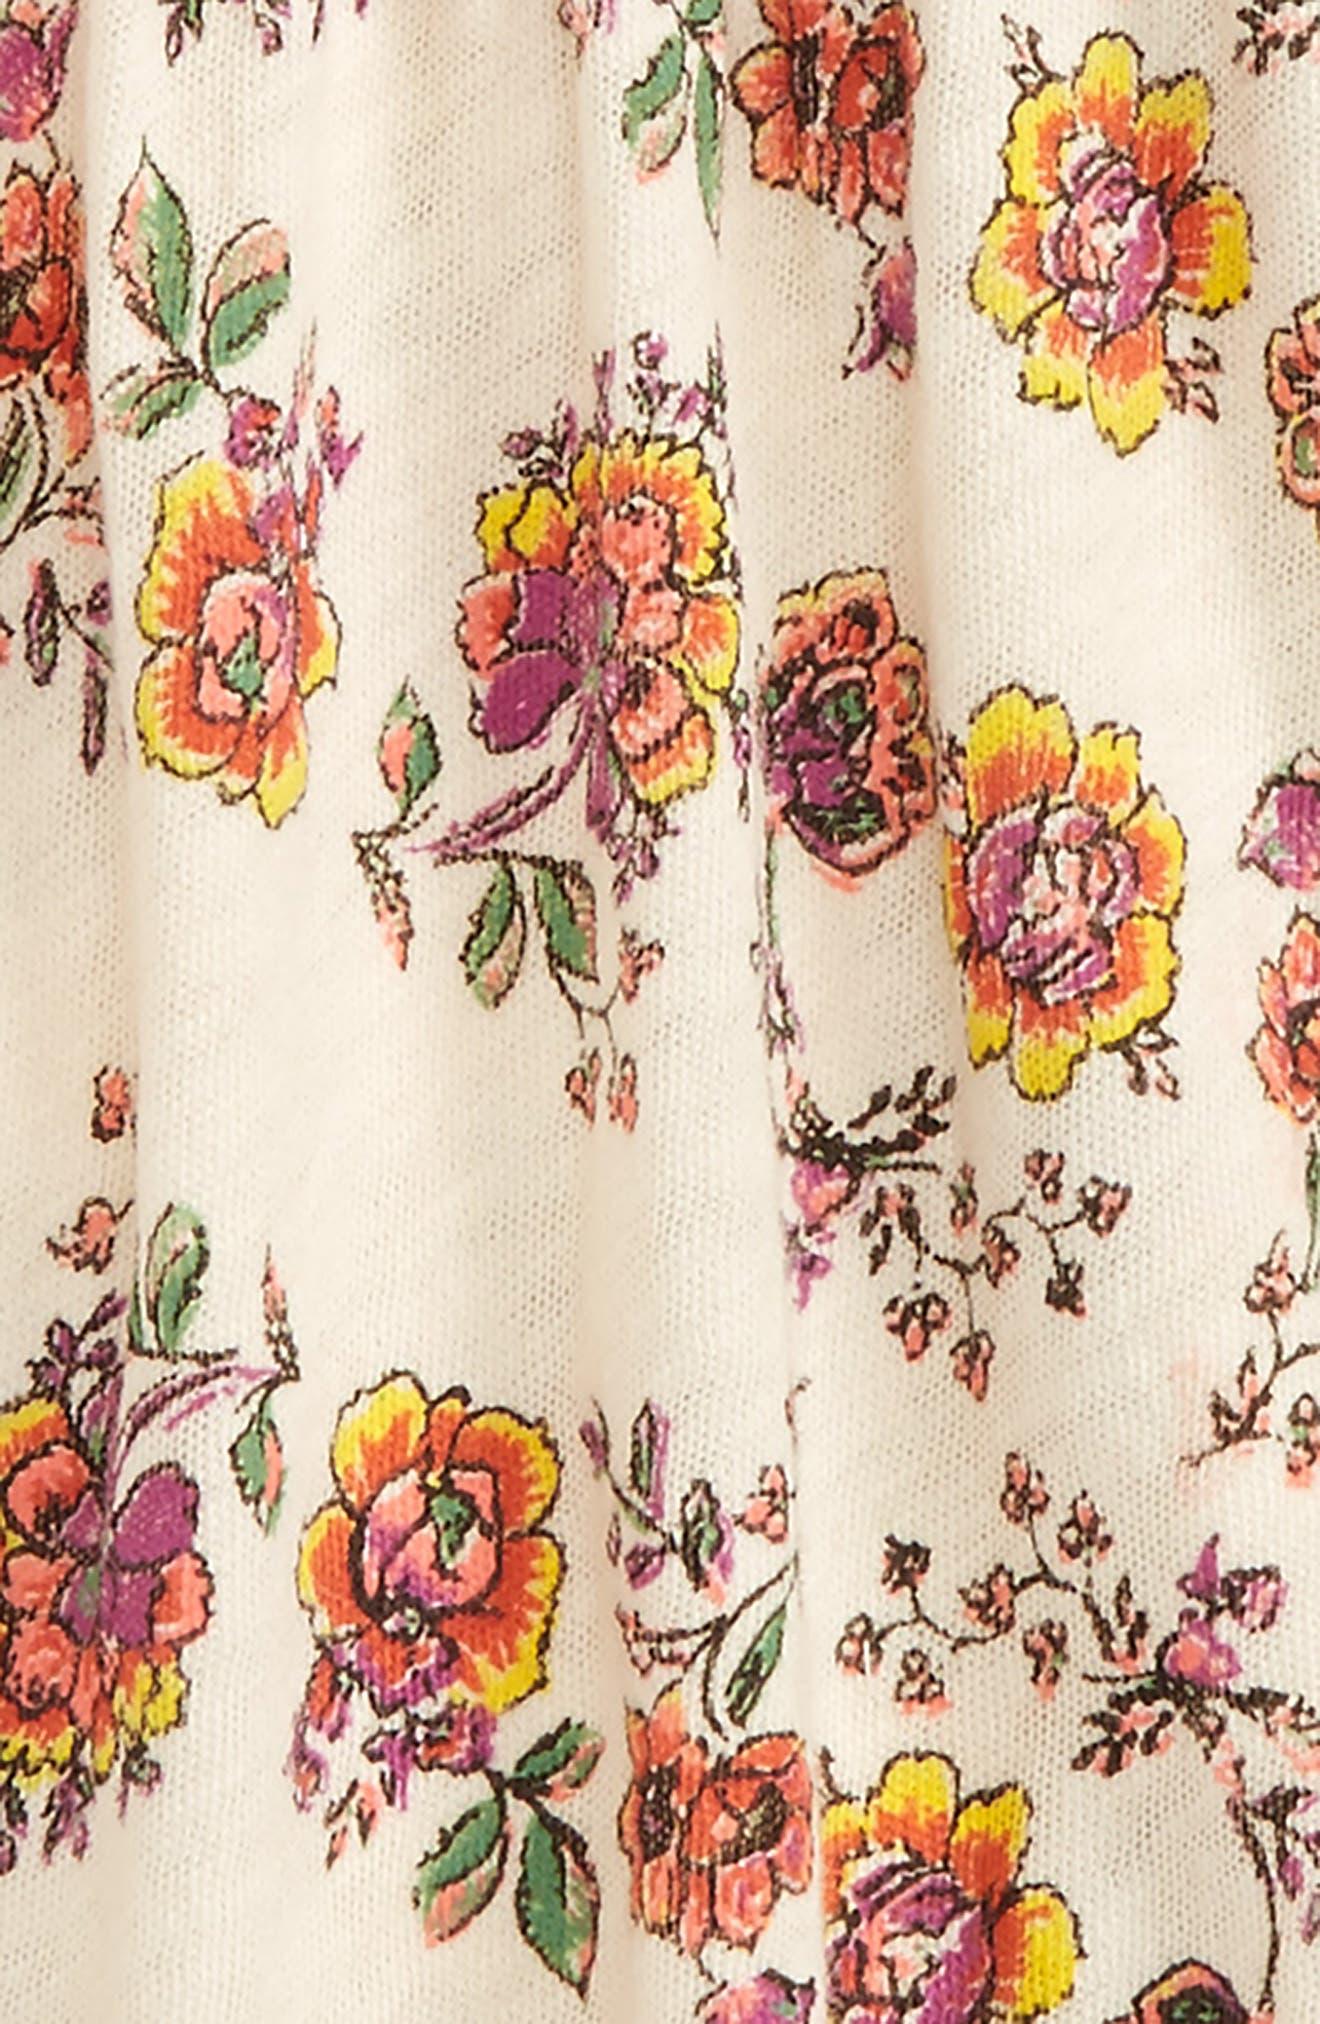 Peek Floral Print Dress,                             Alternate thumbnail 2, color,                             900